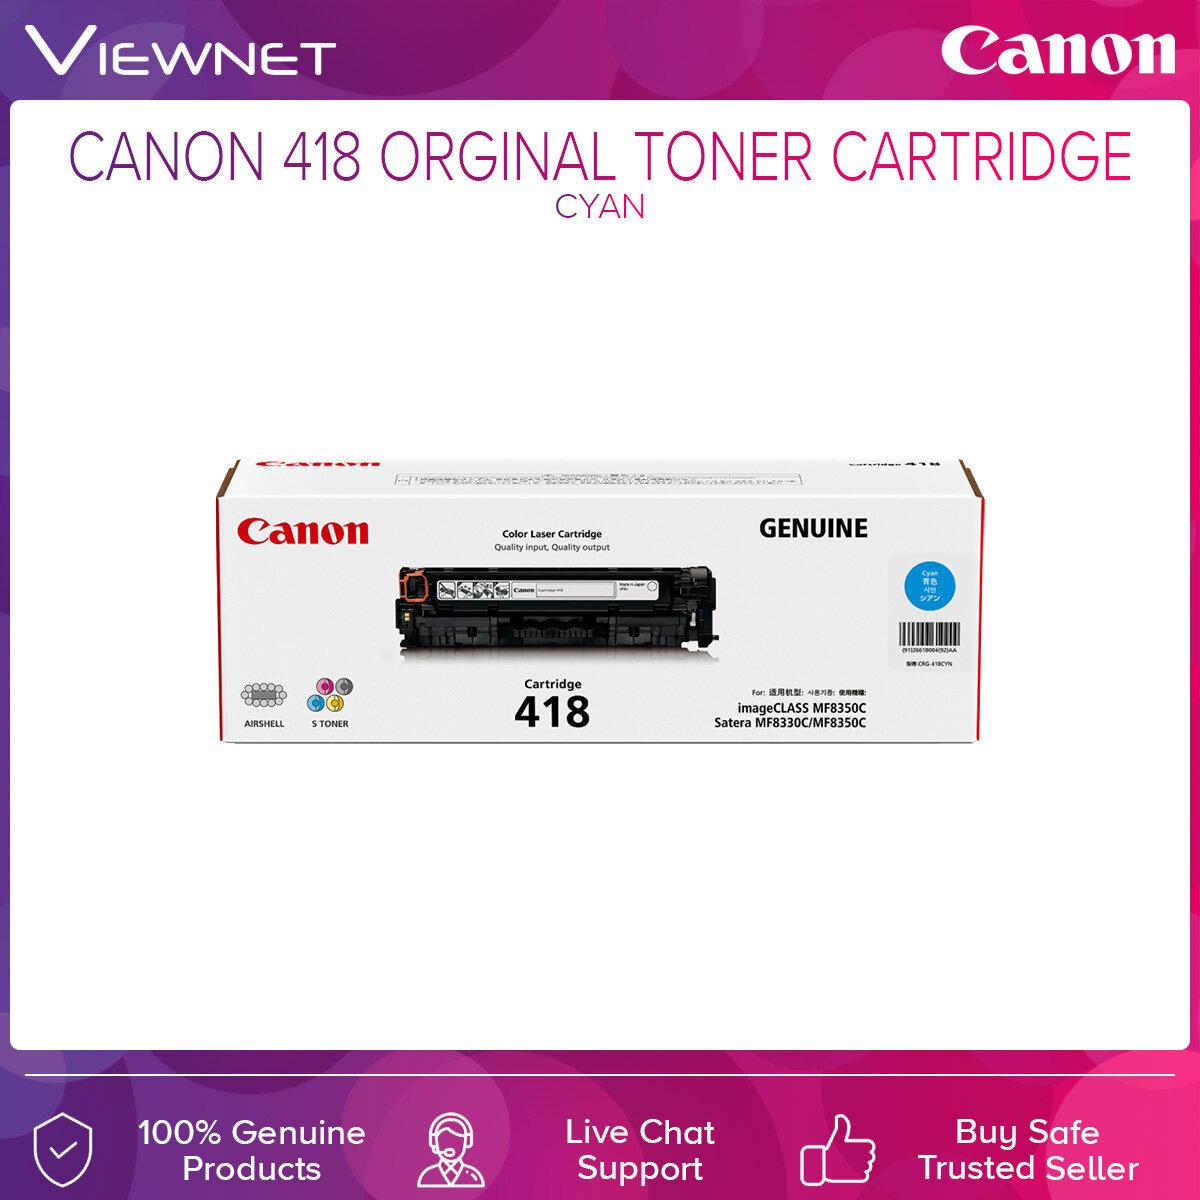 Canon 418 ORIGINAL TONER CARTRIDGE Black  Cyan  Magenta  Yellow